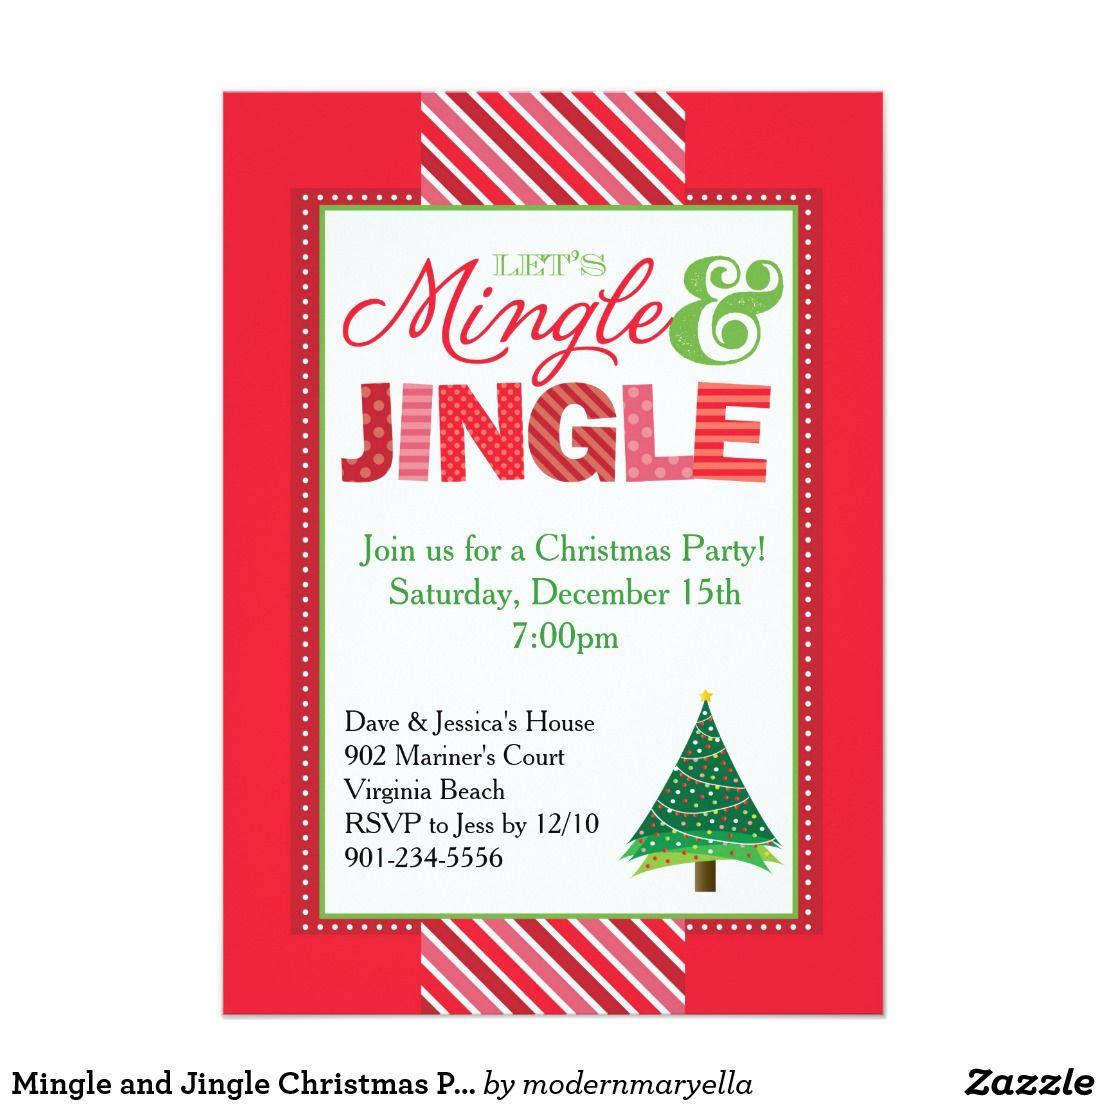 Mingle and Jingle Christmas Party Invitation | Party | Pinterest ...